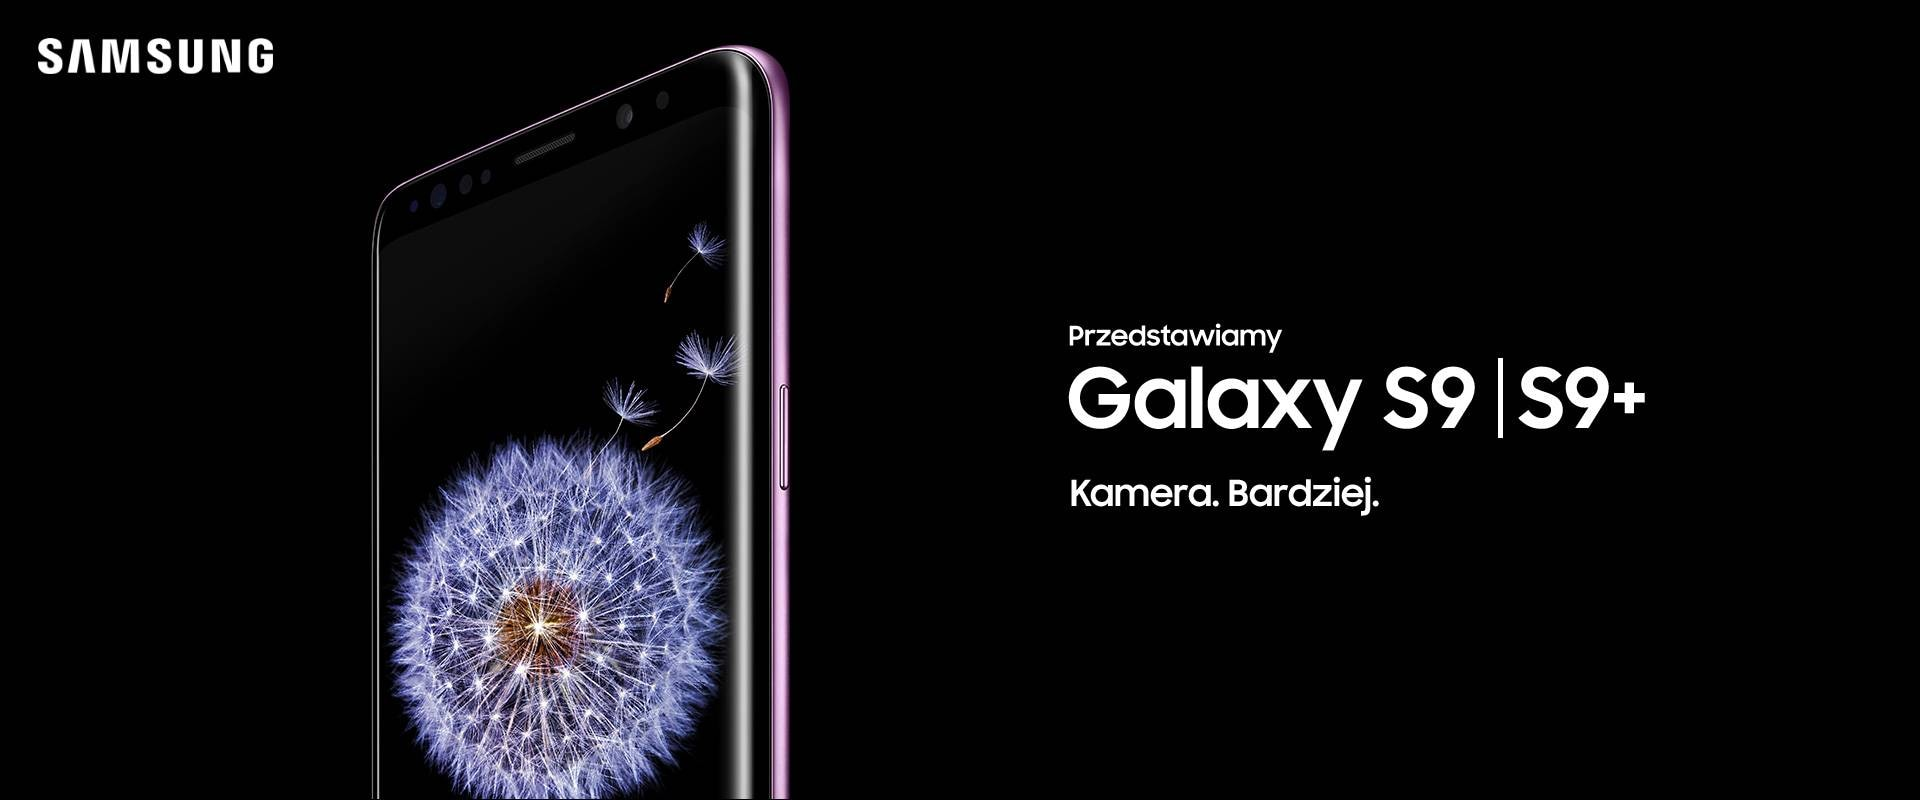 Smartfon Samsung Galaxy S9 Midnight Black Smartwatch Gear S3 Frontier